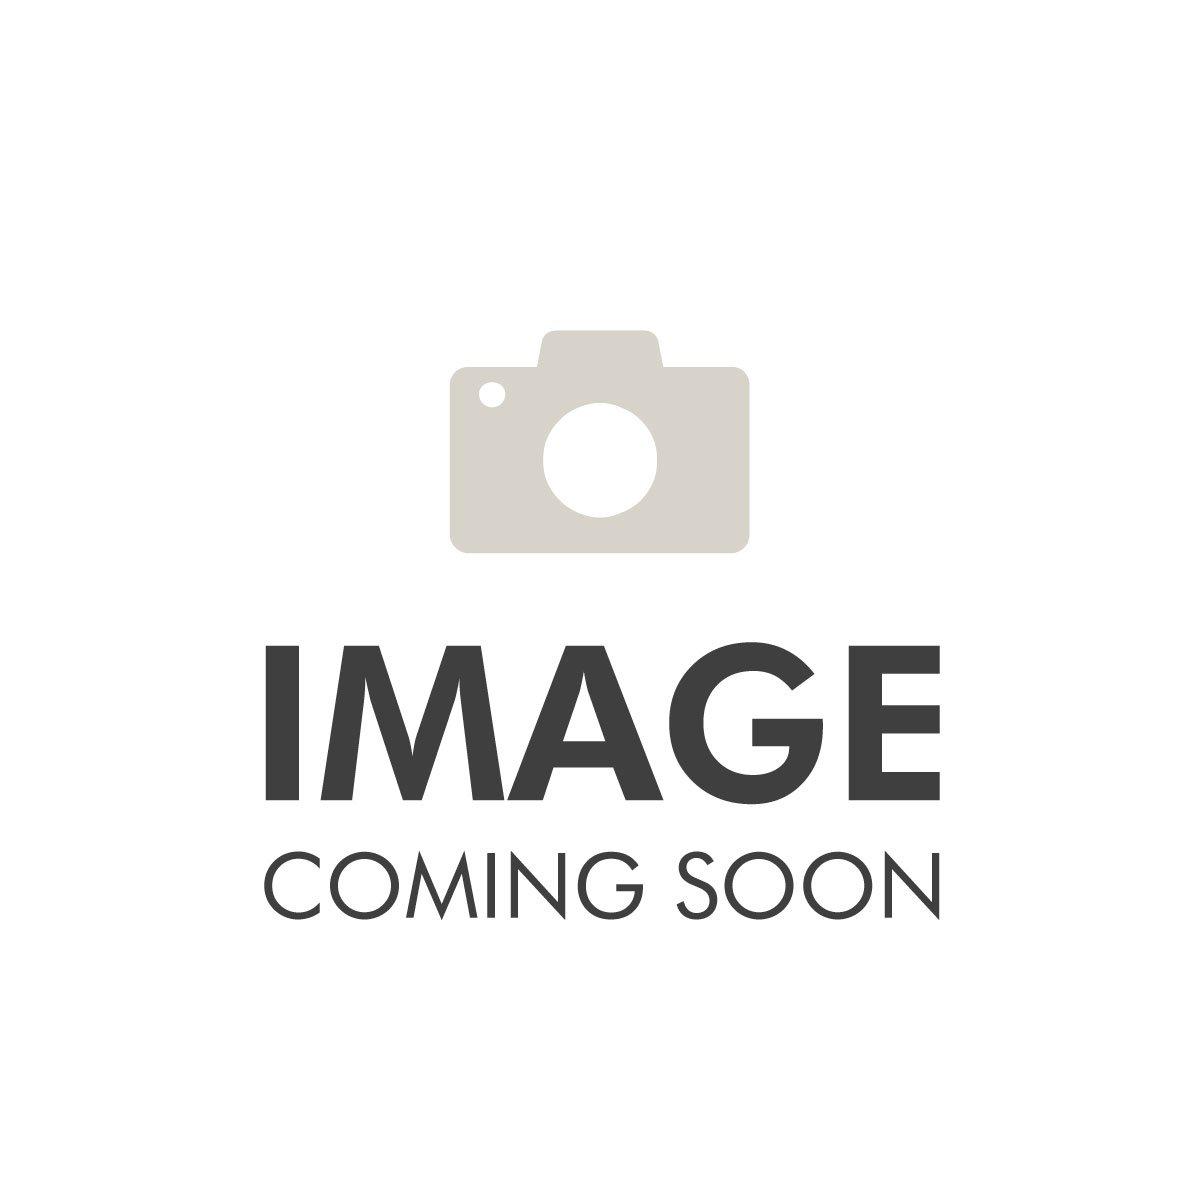 Elizabeth Arden 2ml Correcting and Hilighting Perfector Shade 1